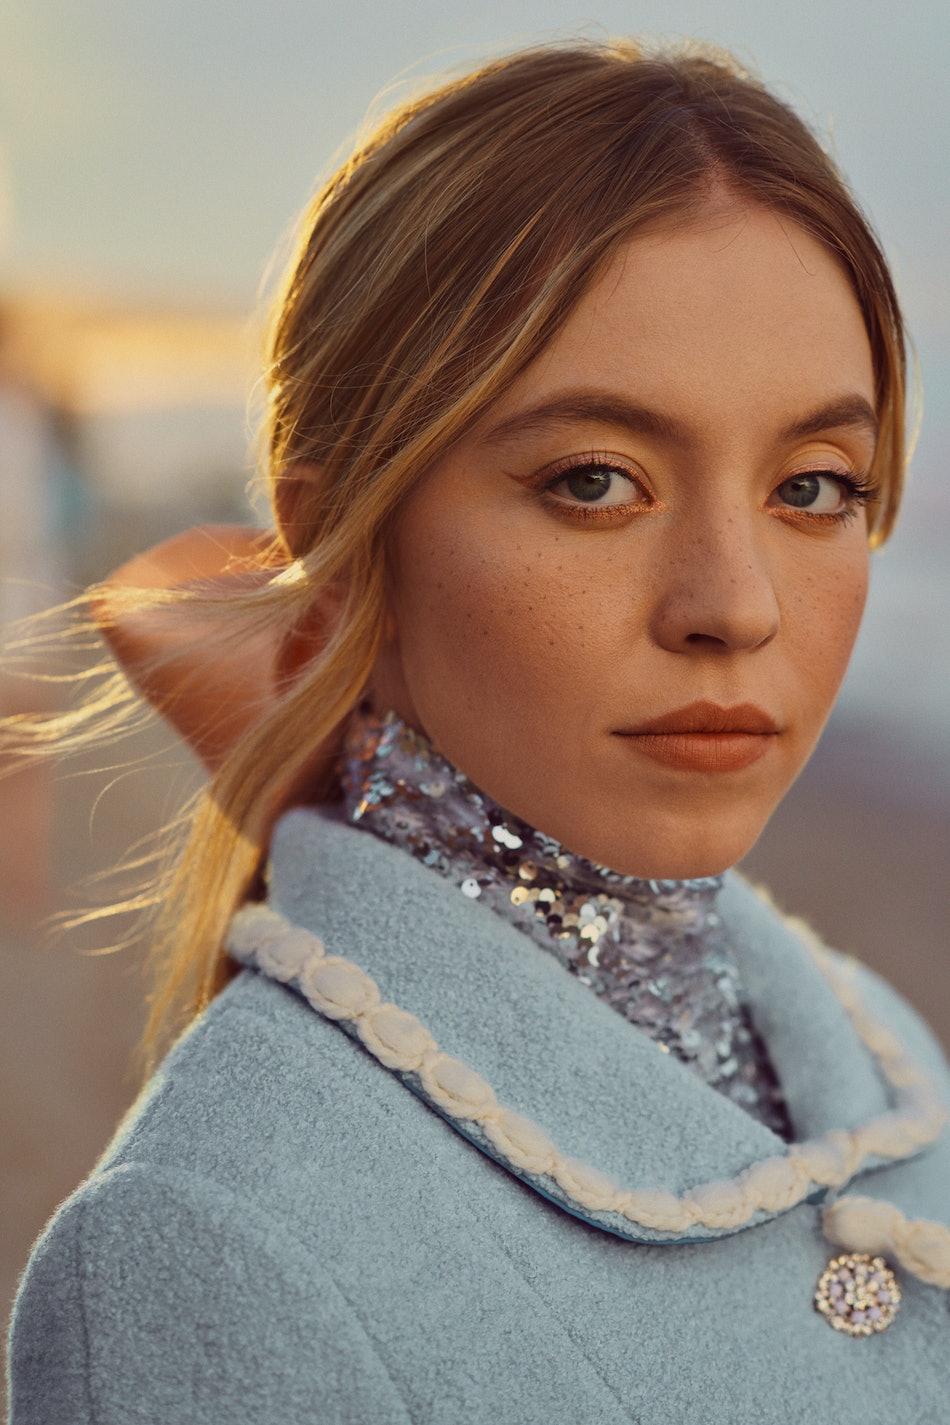 'Euphoria' star Sydney Sweeney for Elite Daily's Like Magic 2019 issue.